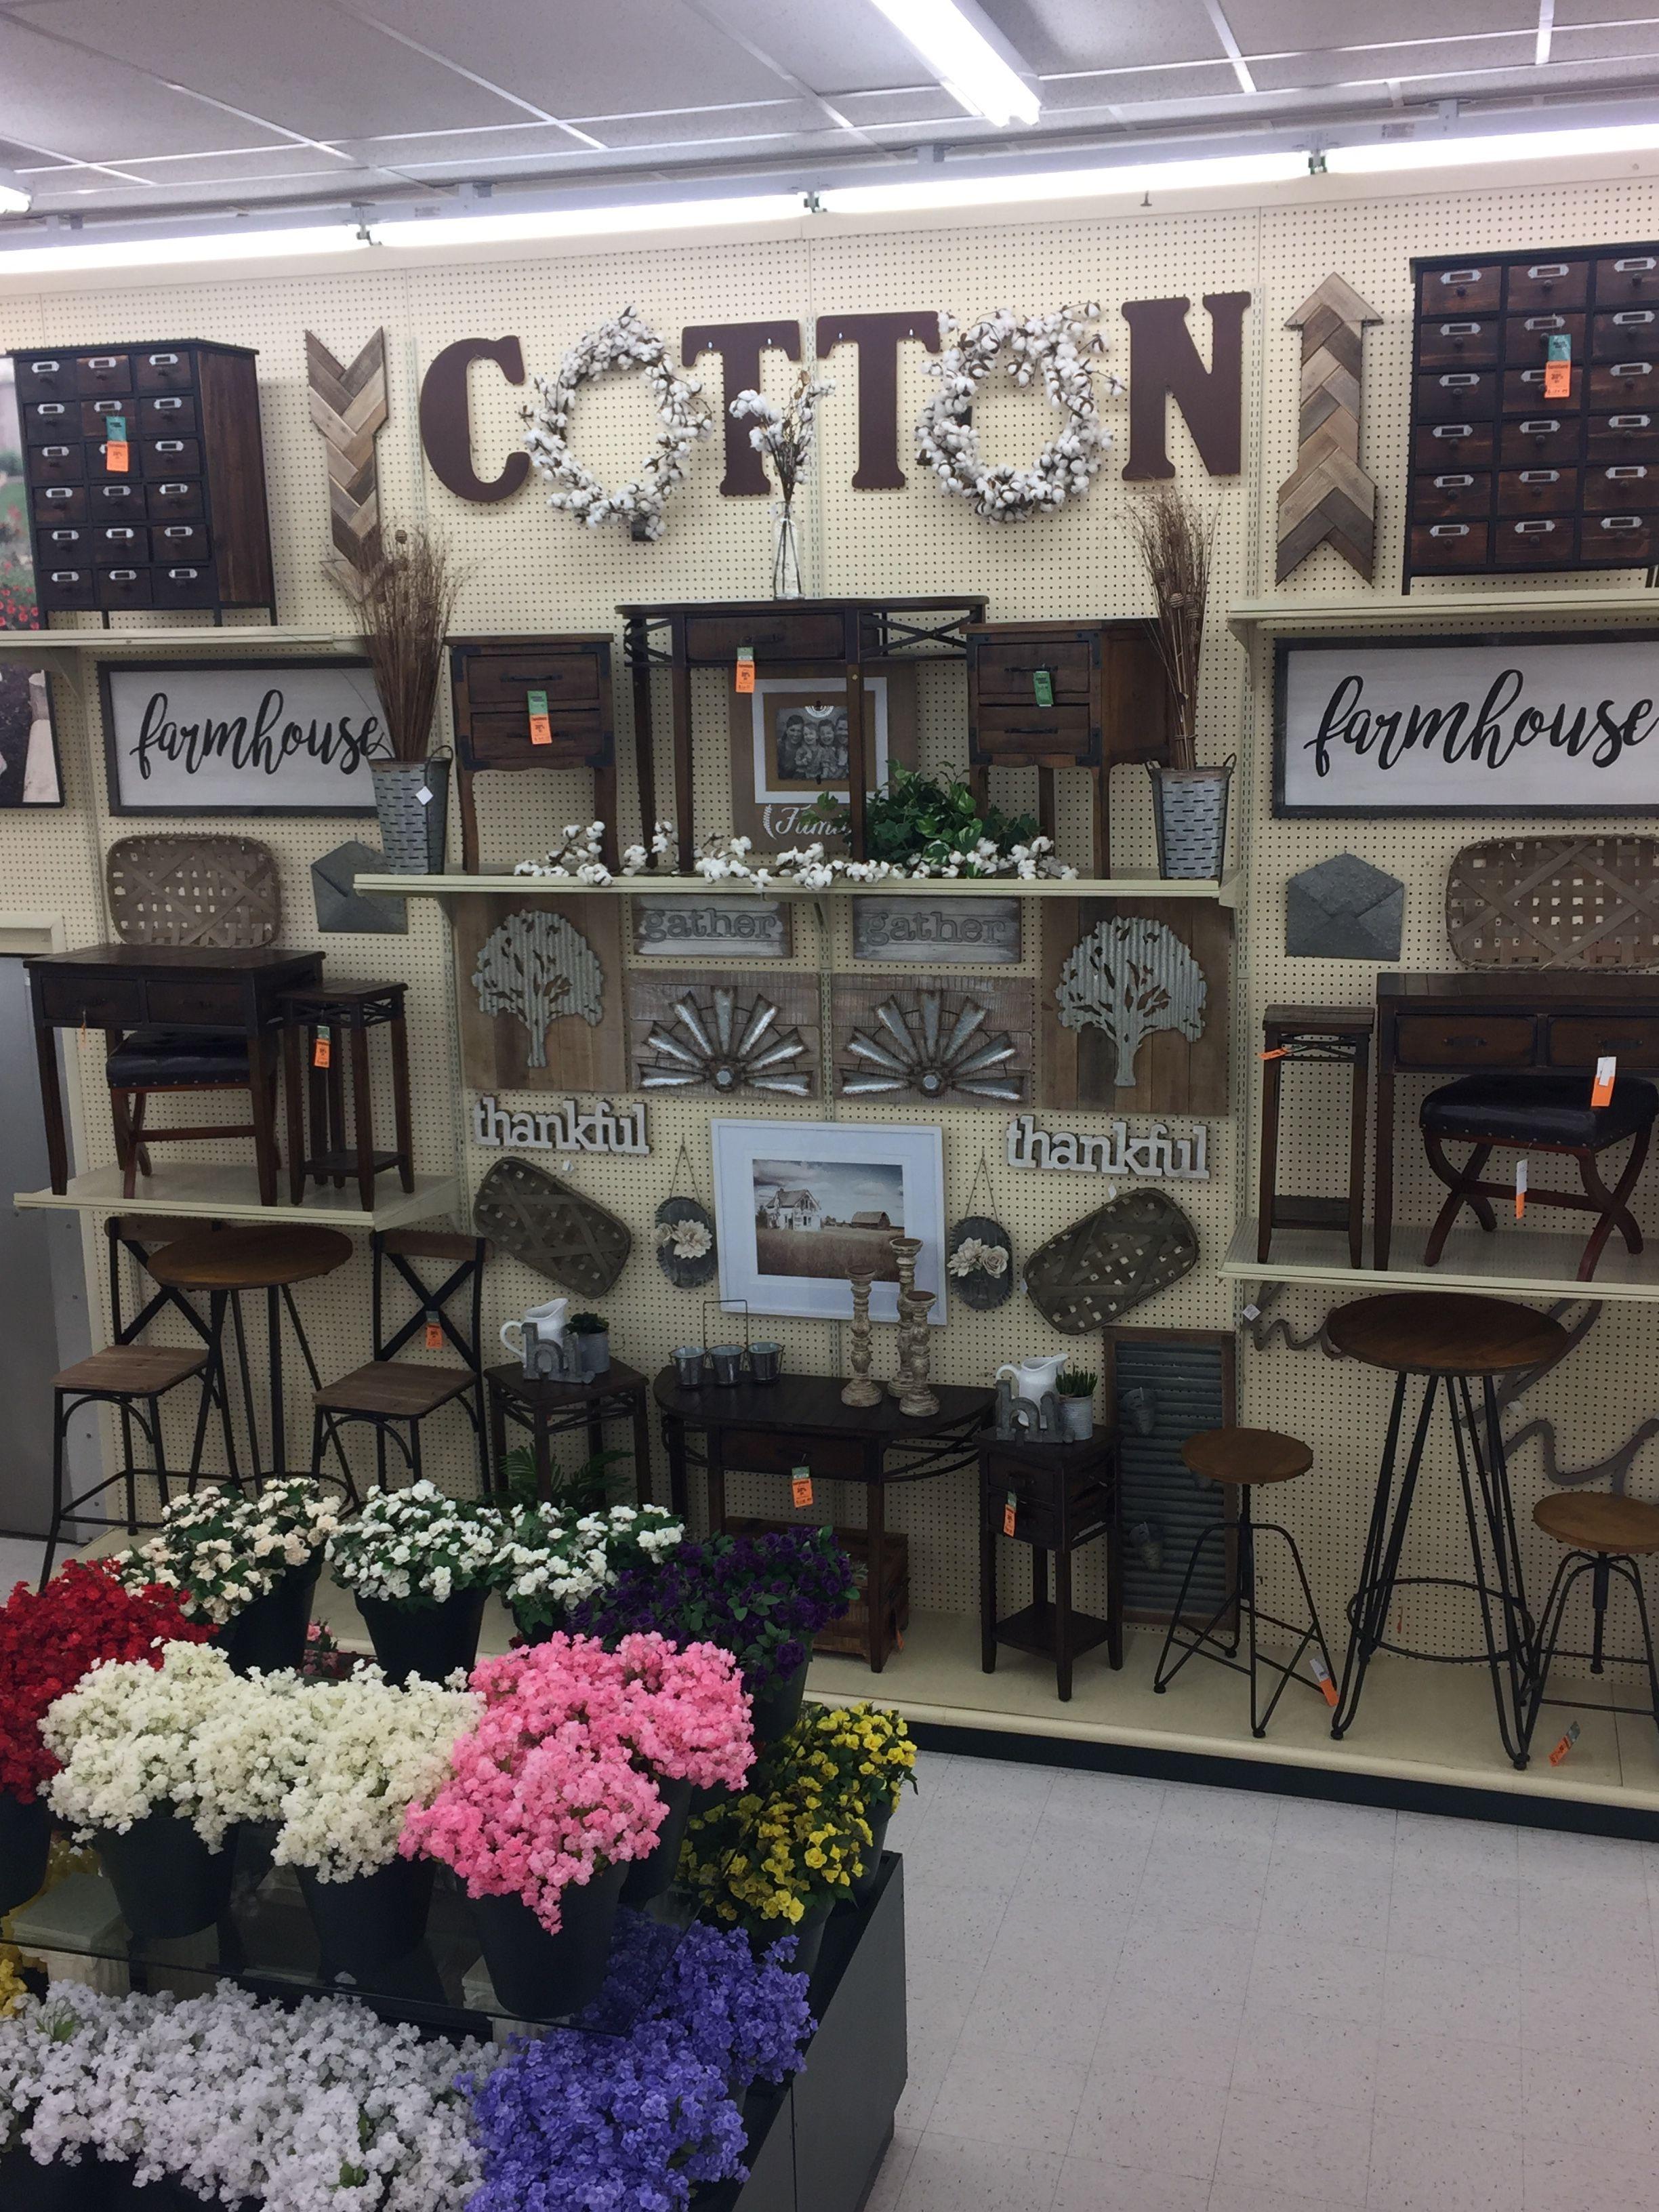 Cotton (With images) | Home decor, Farmhouse wall decor, Decor